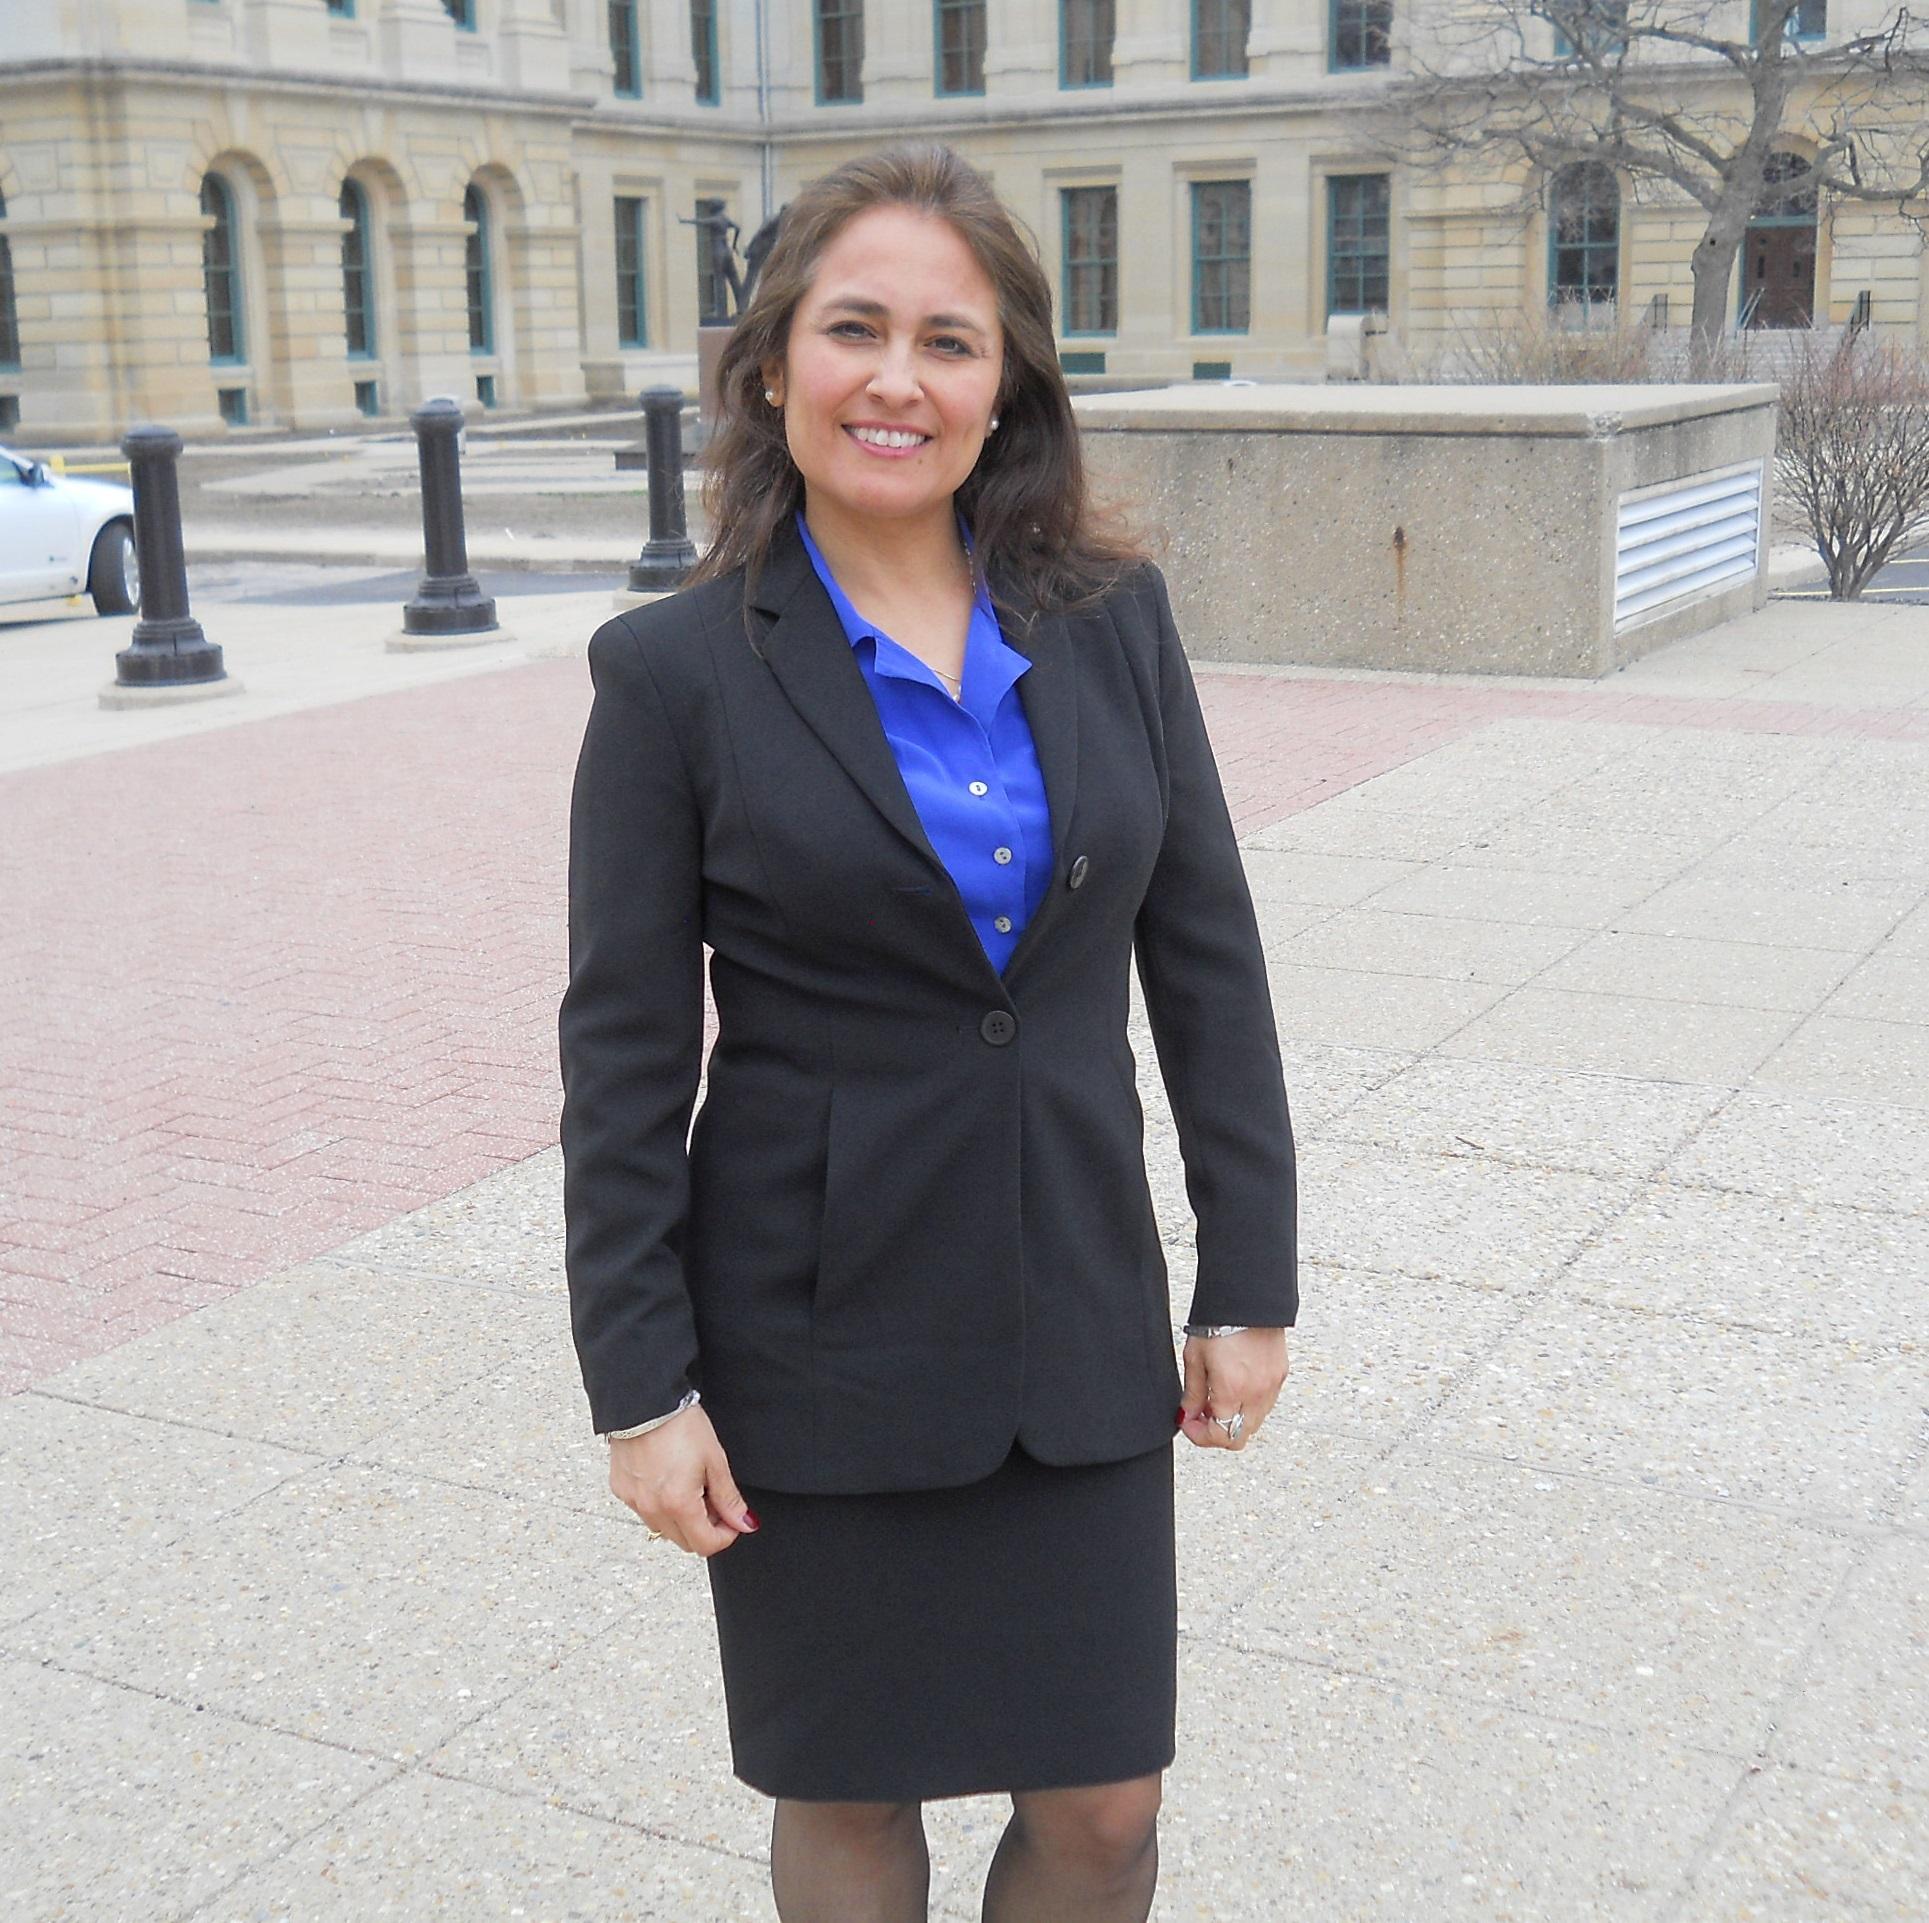 Dr.Sandra Arango-Padron